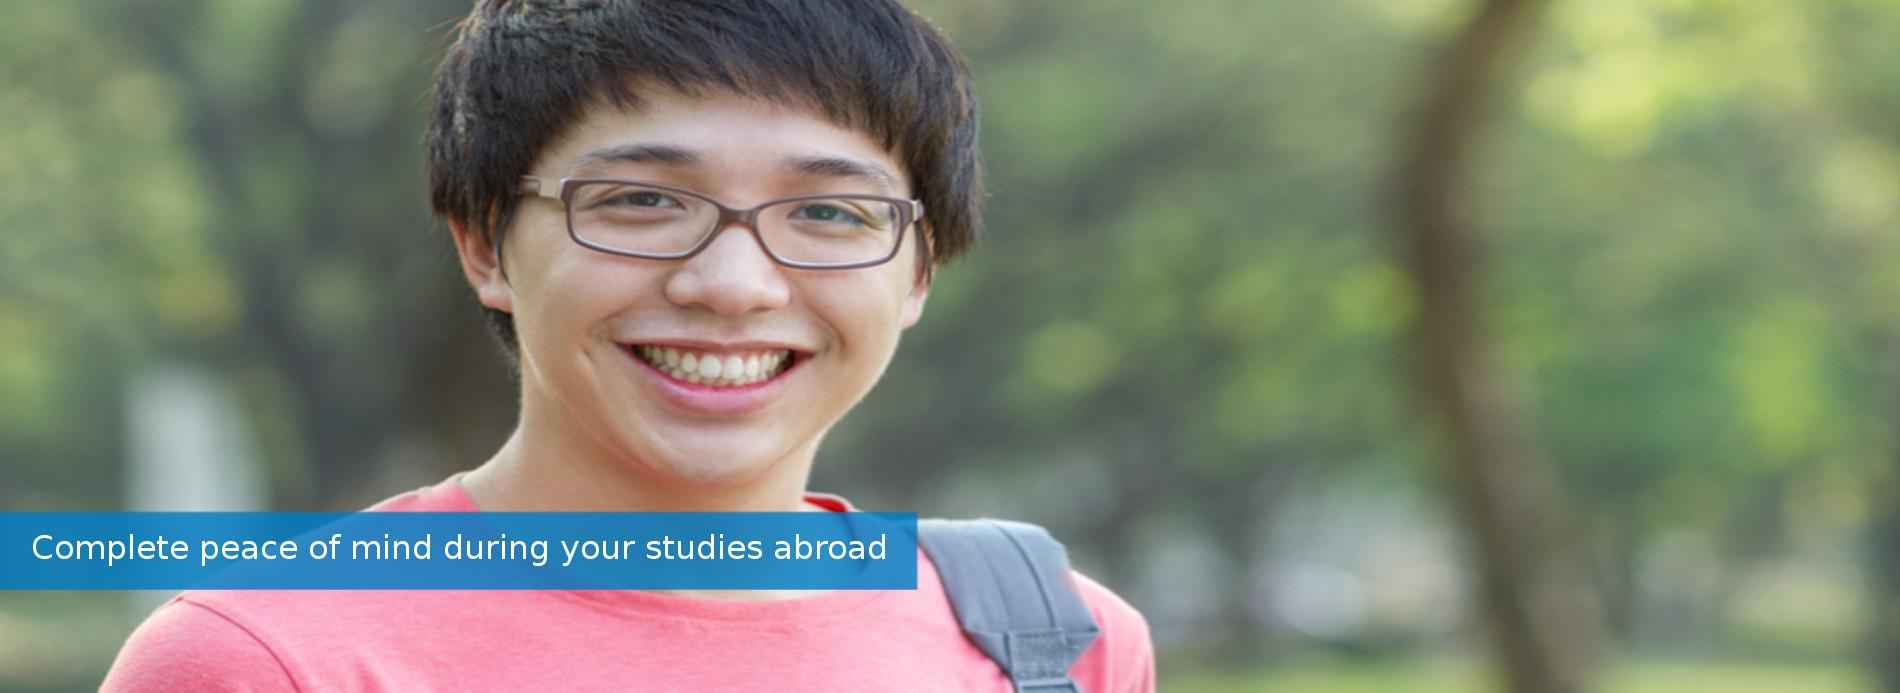 overseas-study-protection-plan